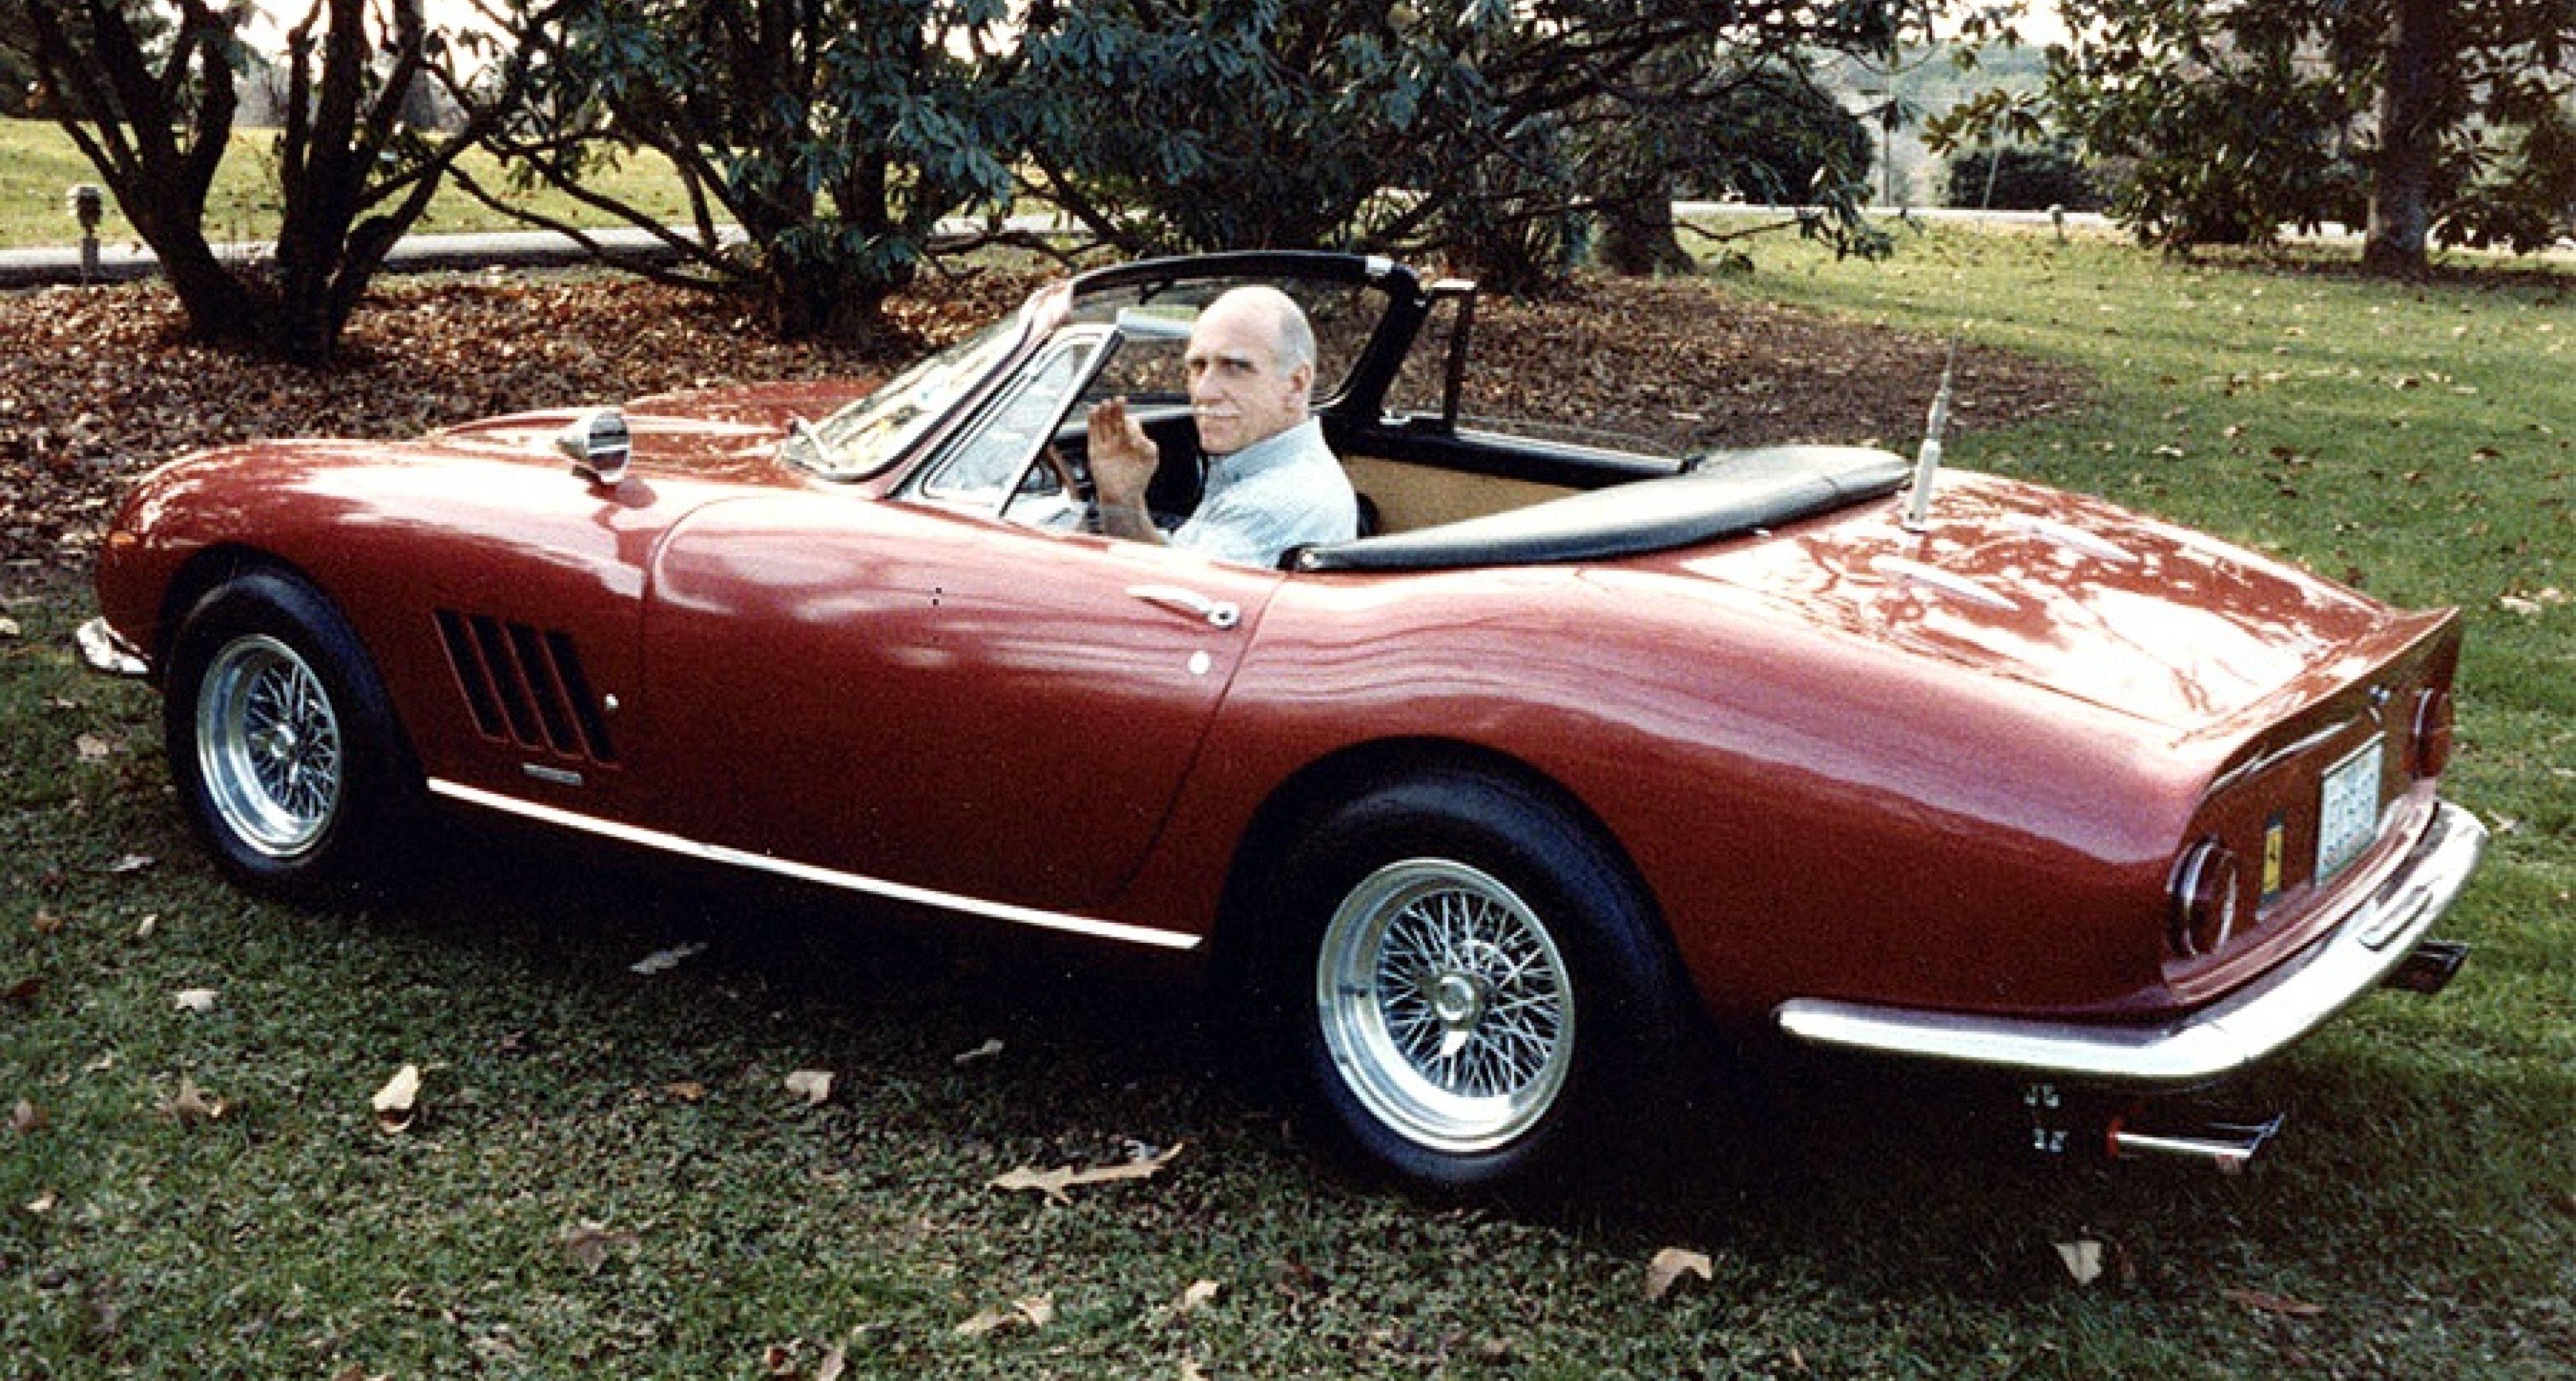 1967 Ferrari N.A.R.T. Spider USD 27,500,000